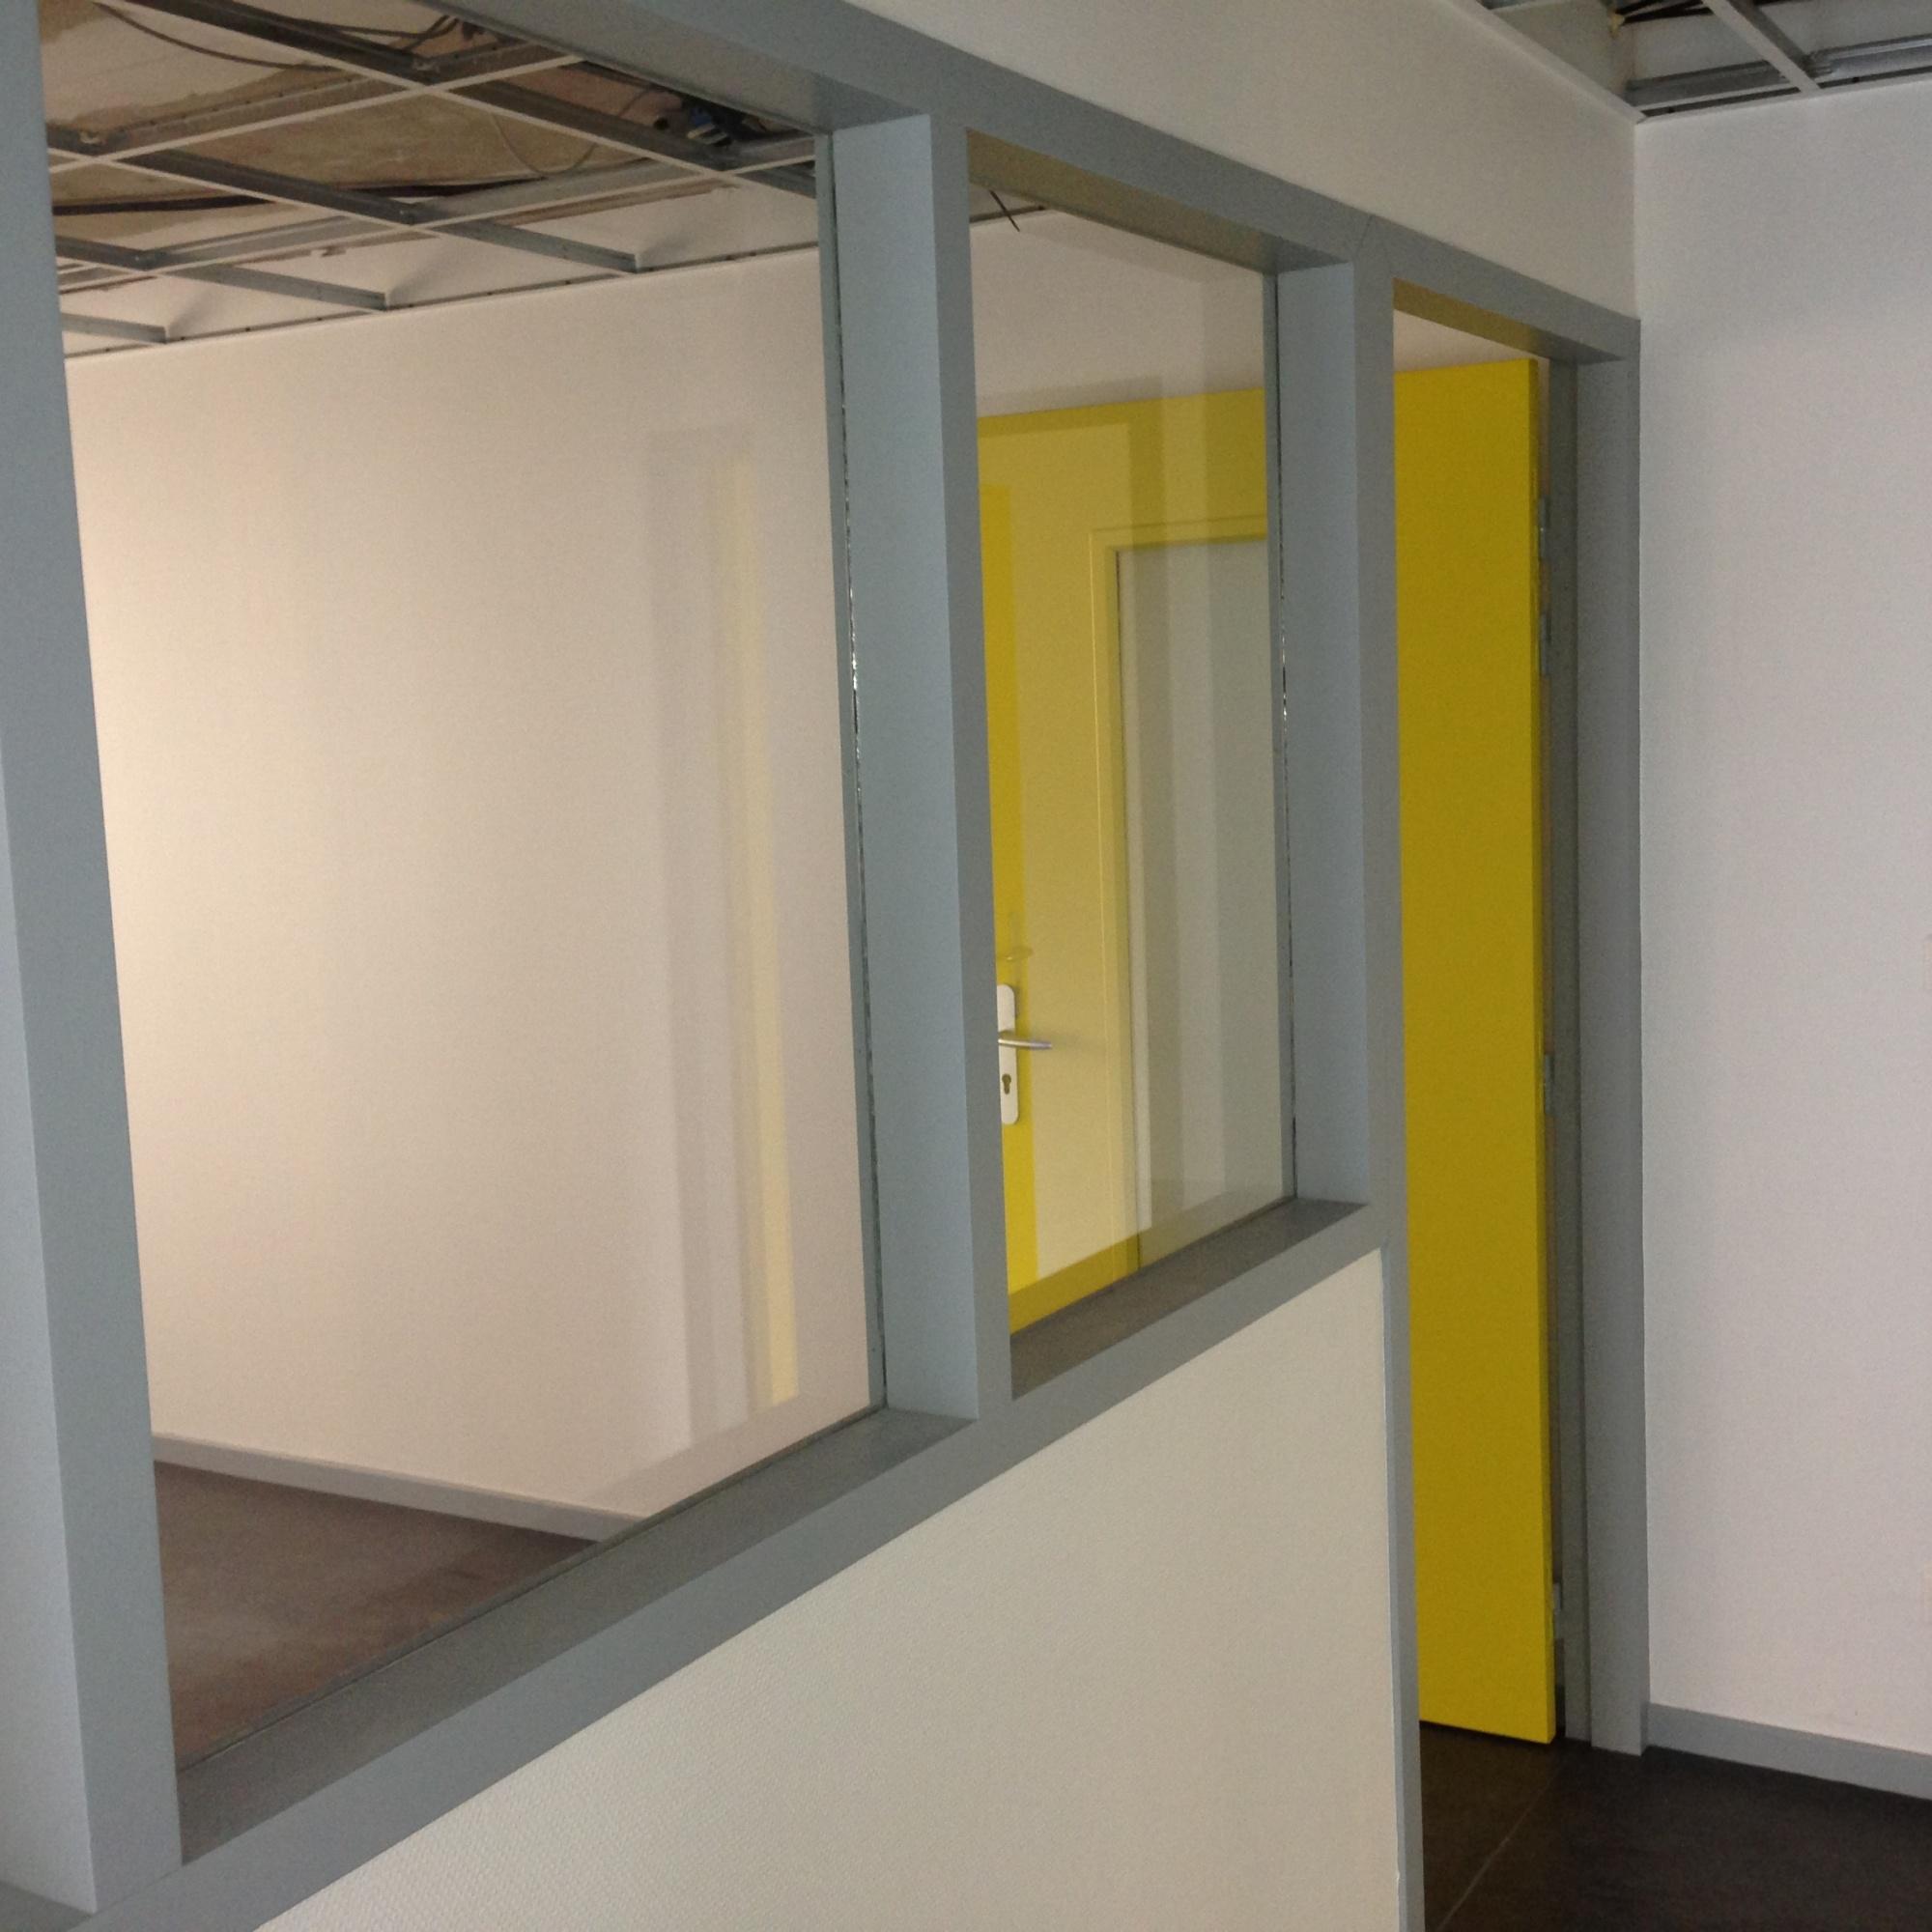 Menuiserie interieure for Menuiserie interieur